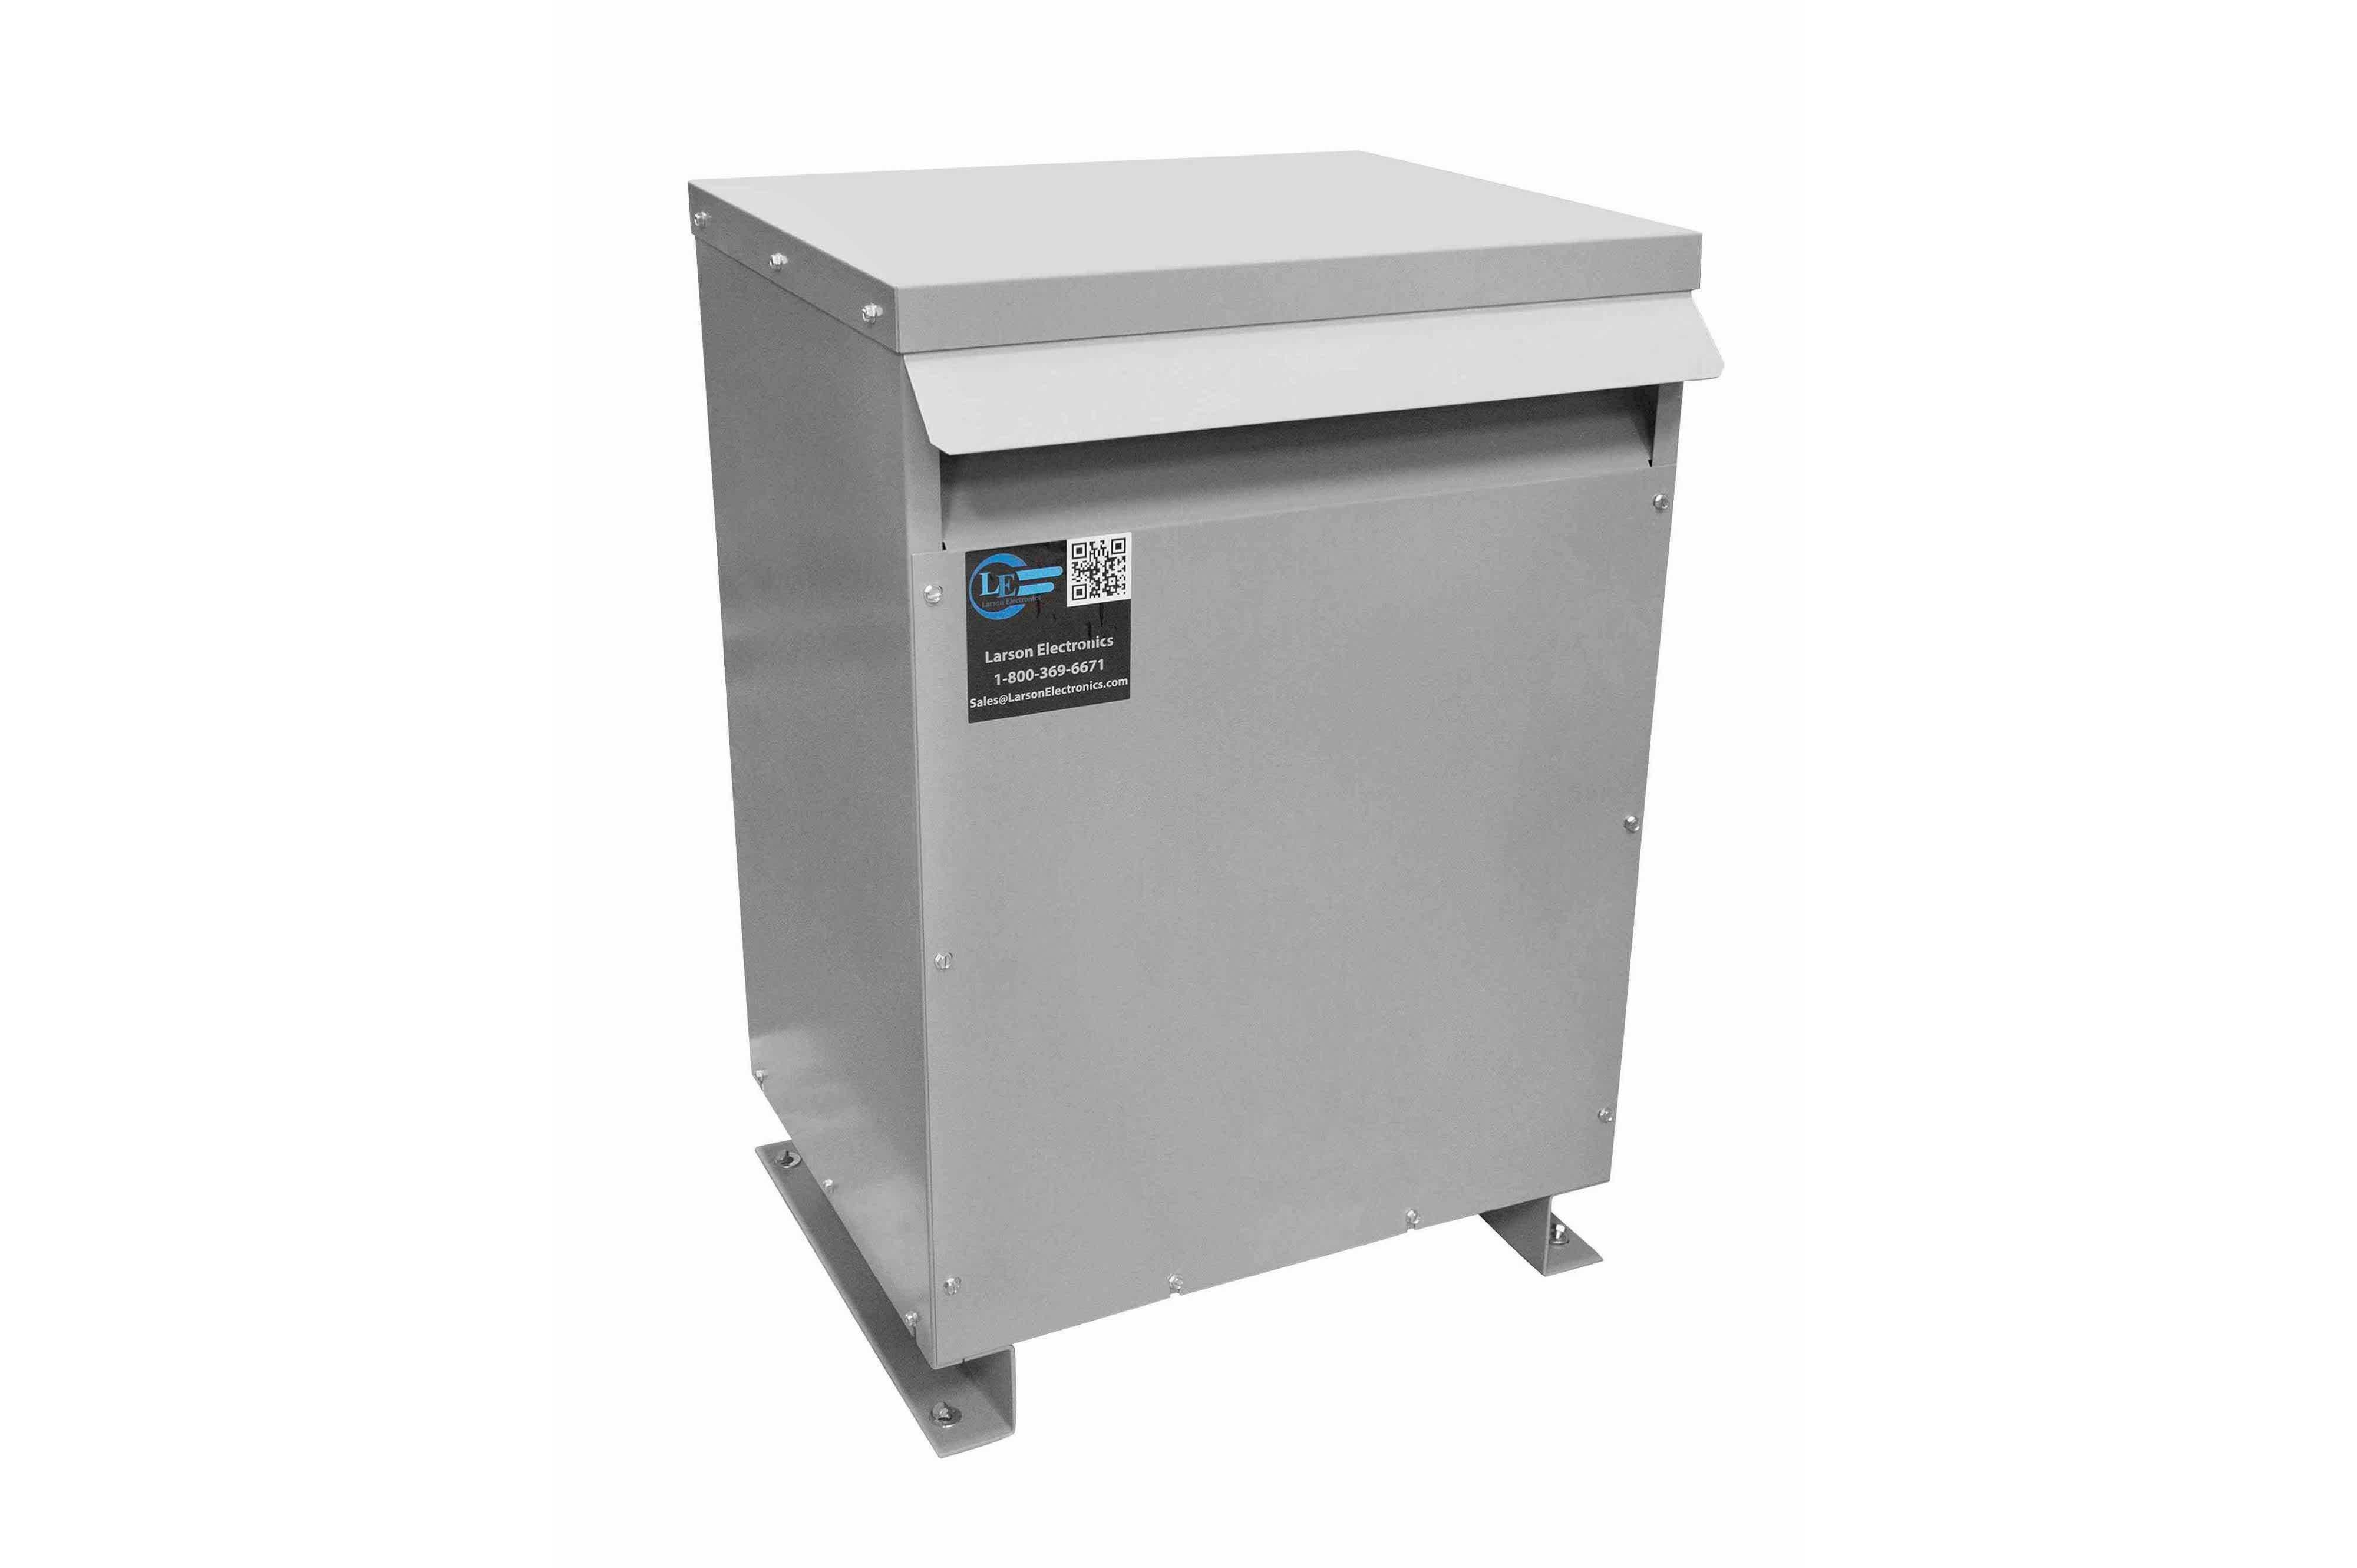 60 kVA 3PH Isolation Transformer, 208V Wye Primary, 208V Delta Secondary, N3R, Ventilated, 60 Hz